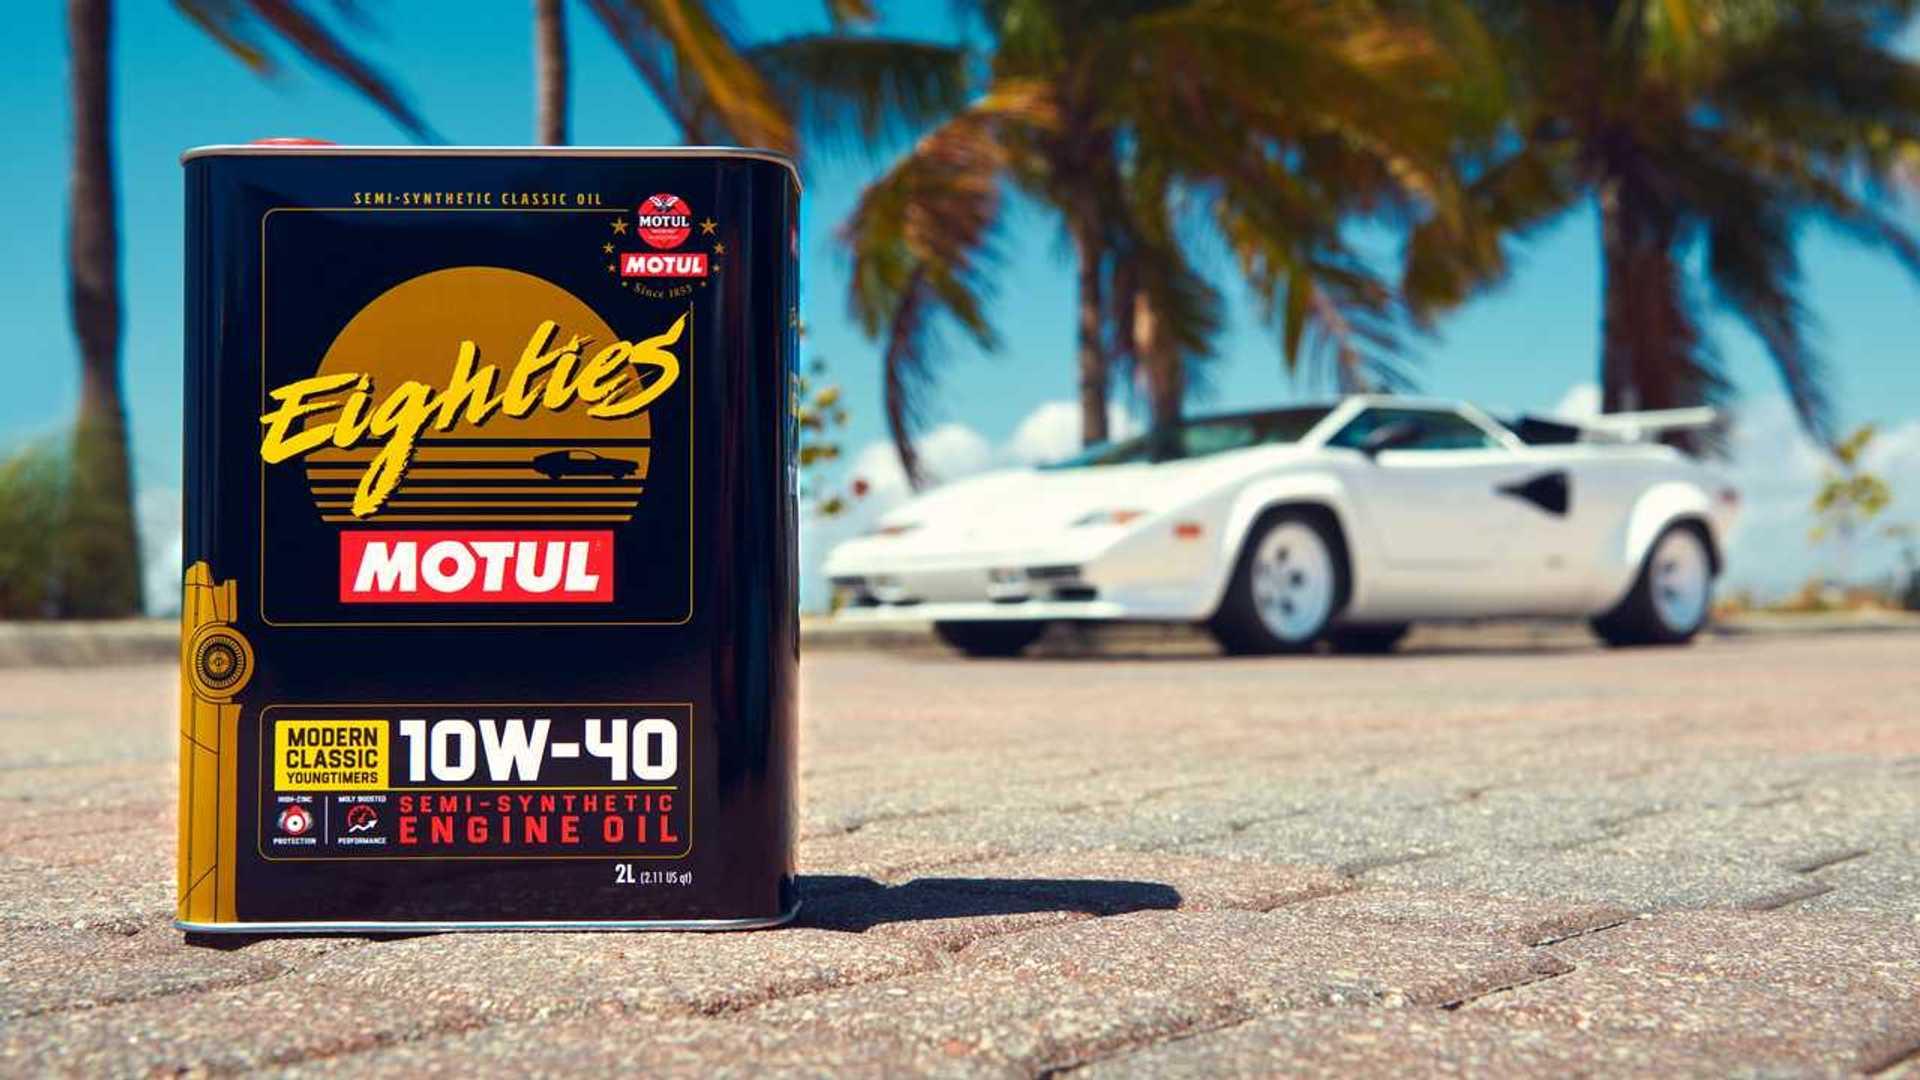 motul-classic-line-oil-10w-40-eighties.j